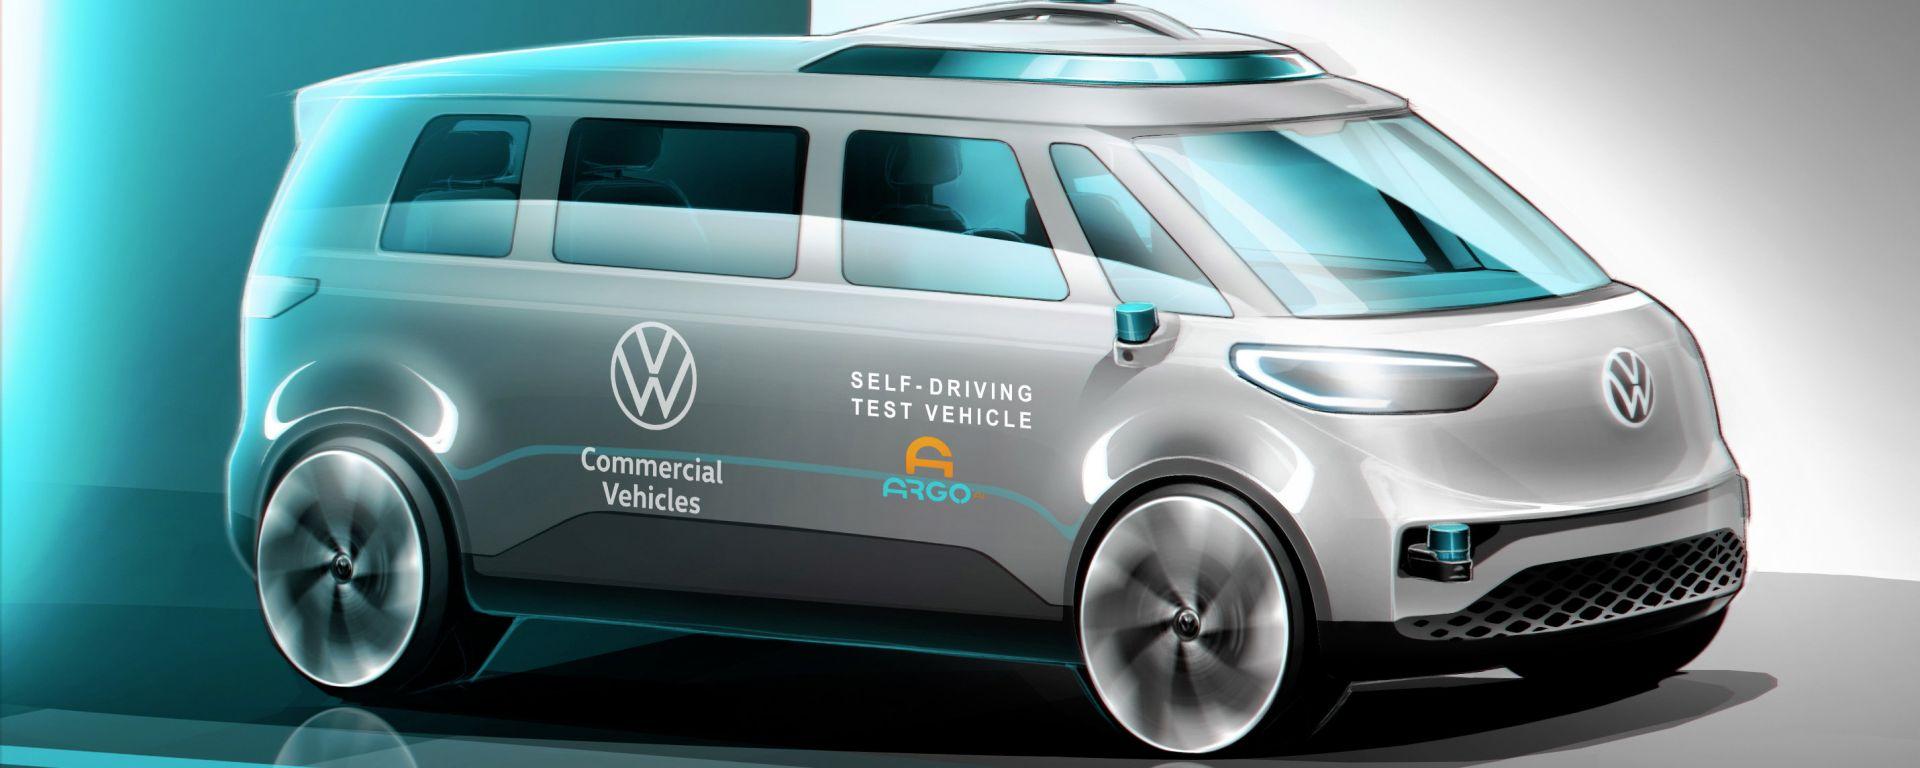 Volkswagen ID.Buzz: la prima VW a guida autonoma sarà un van commerciale